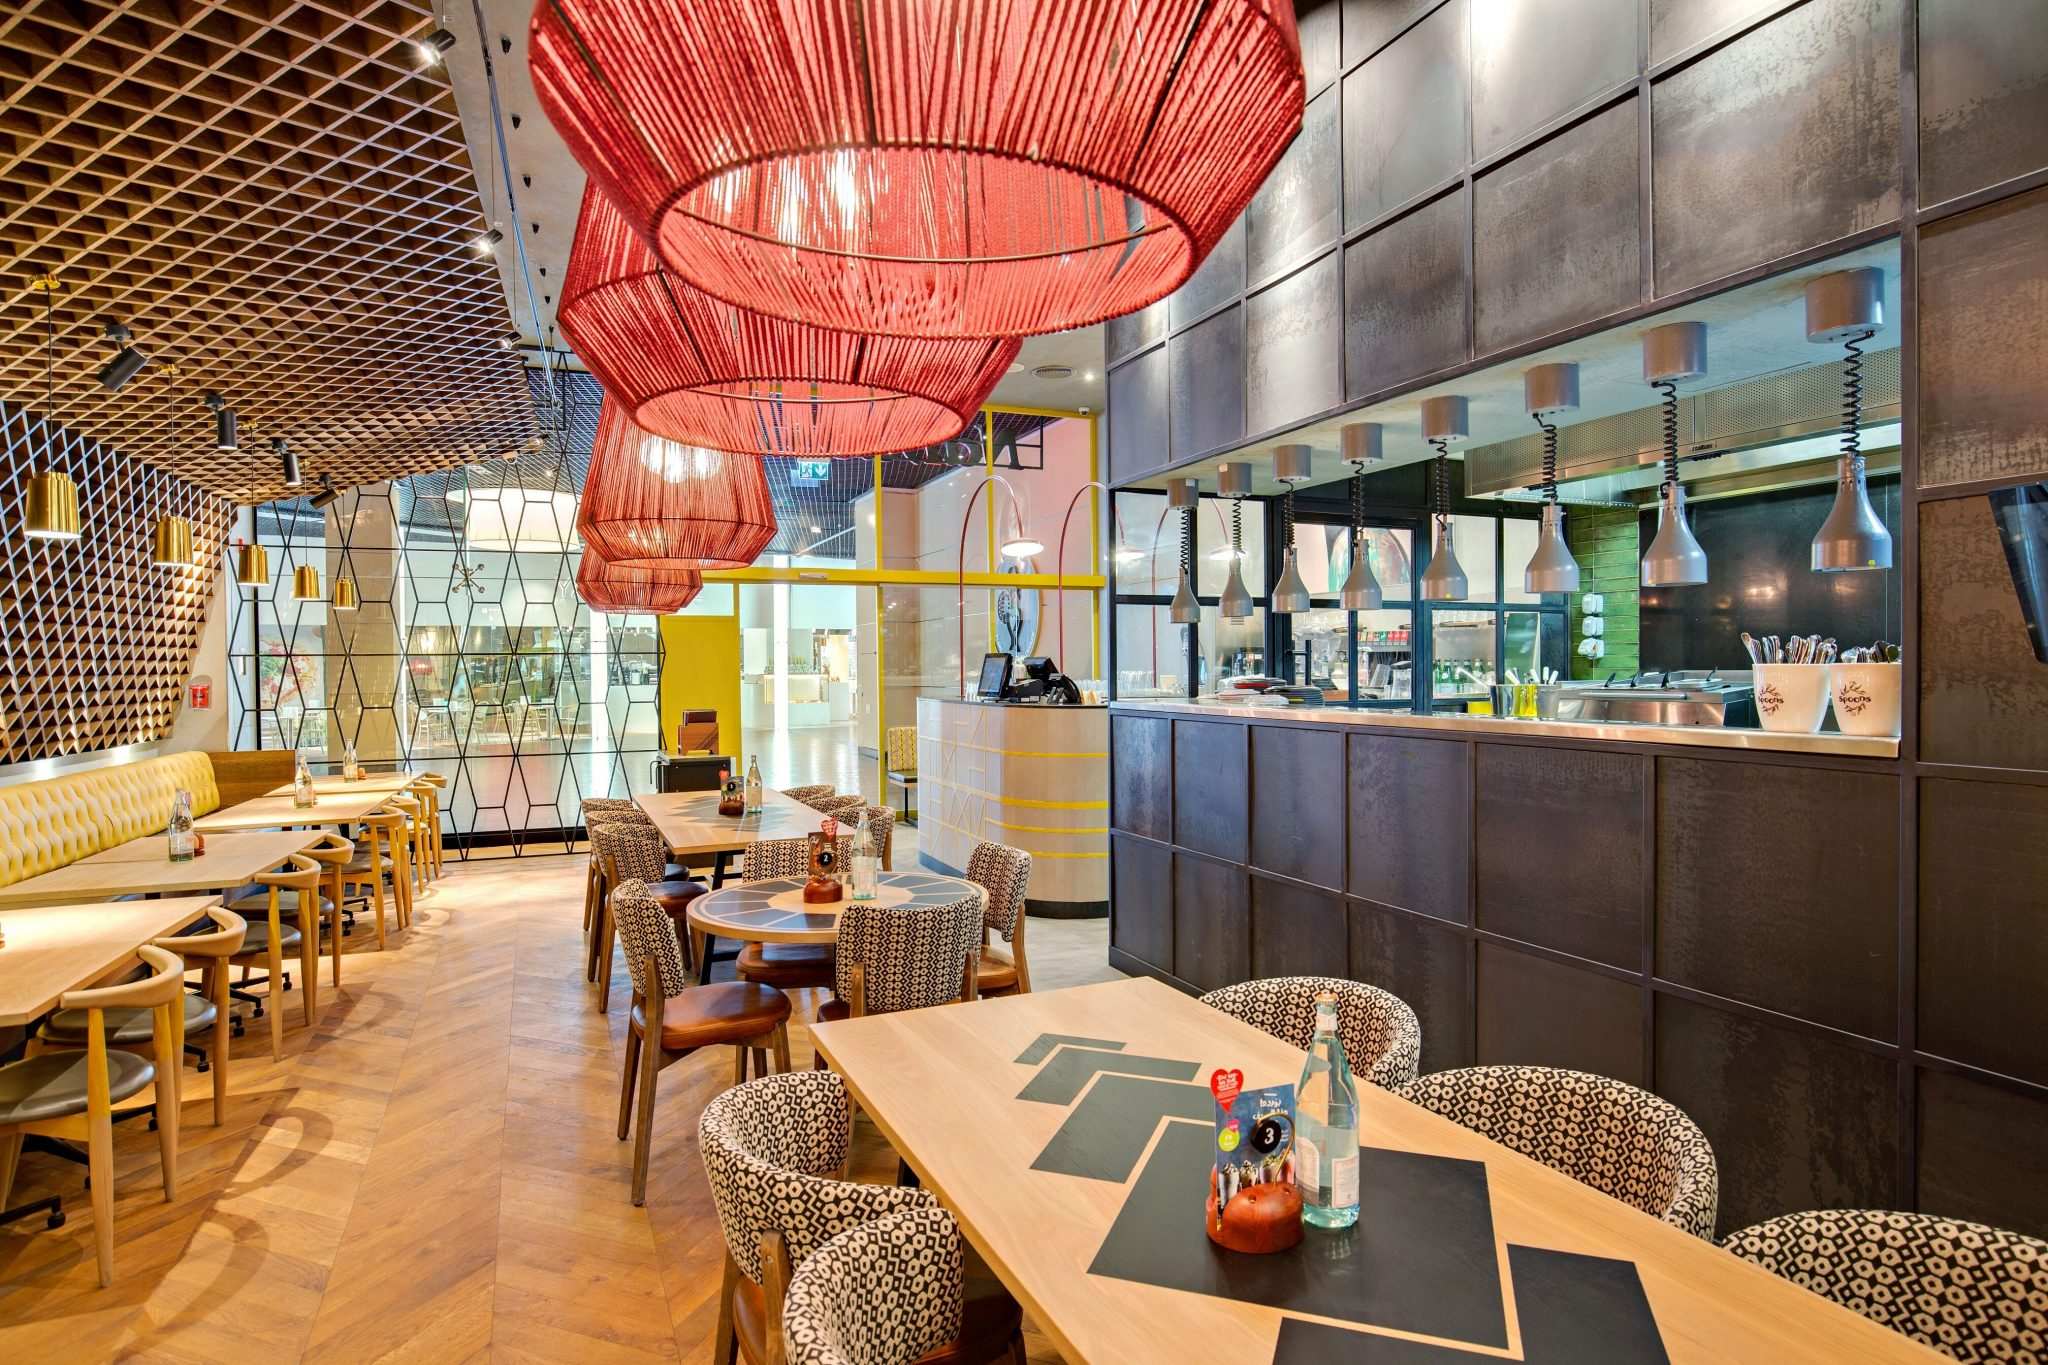 أحدث مطاعم ناندوز في دبي مول